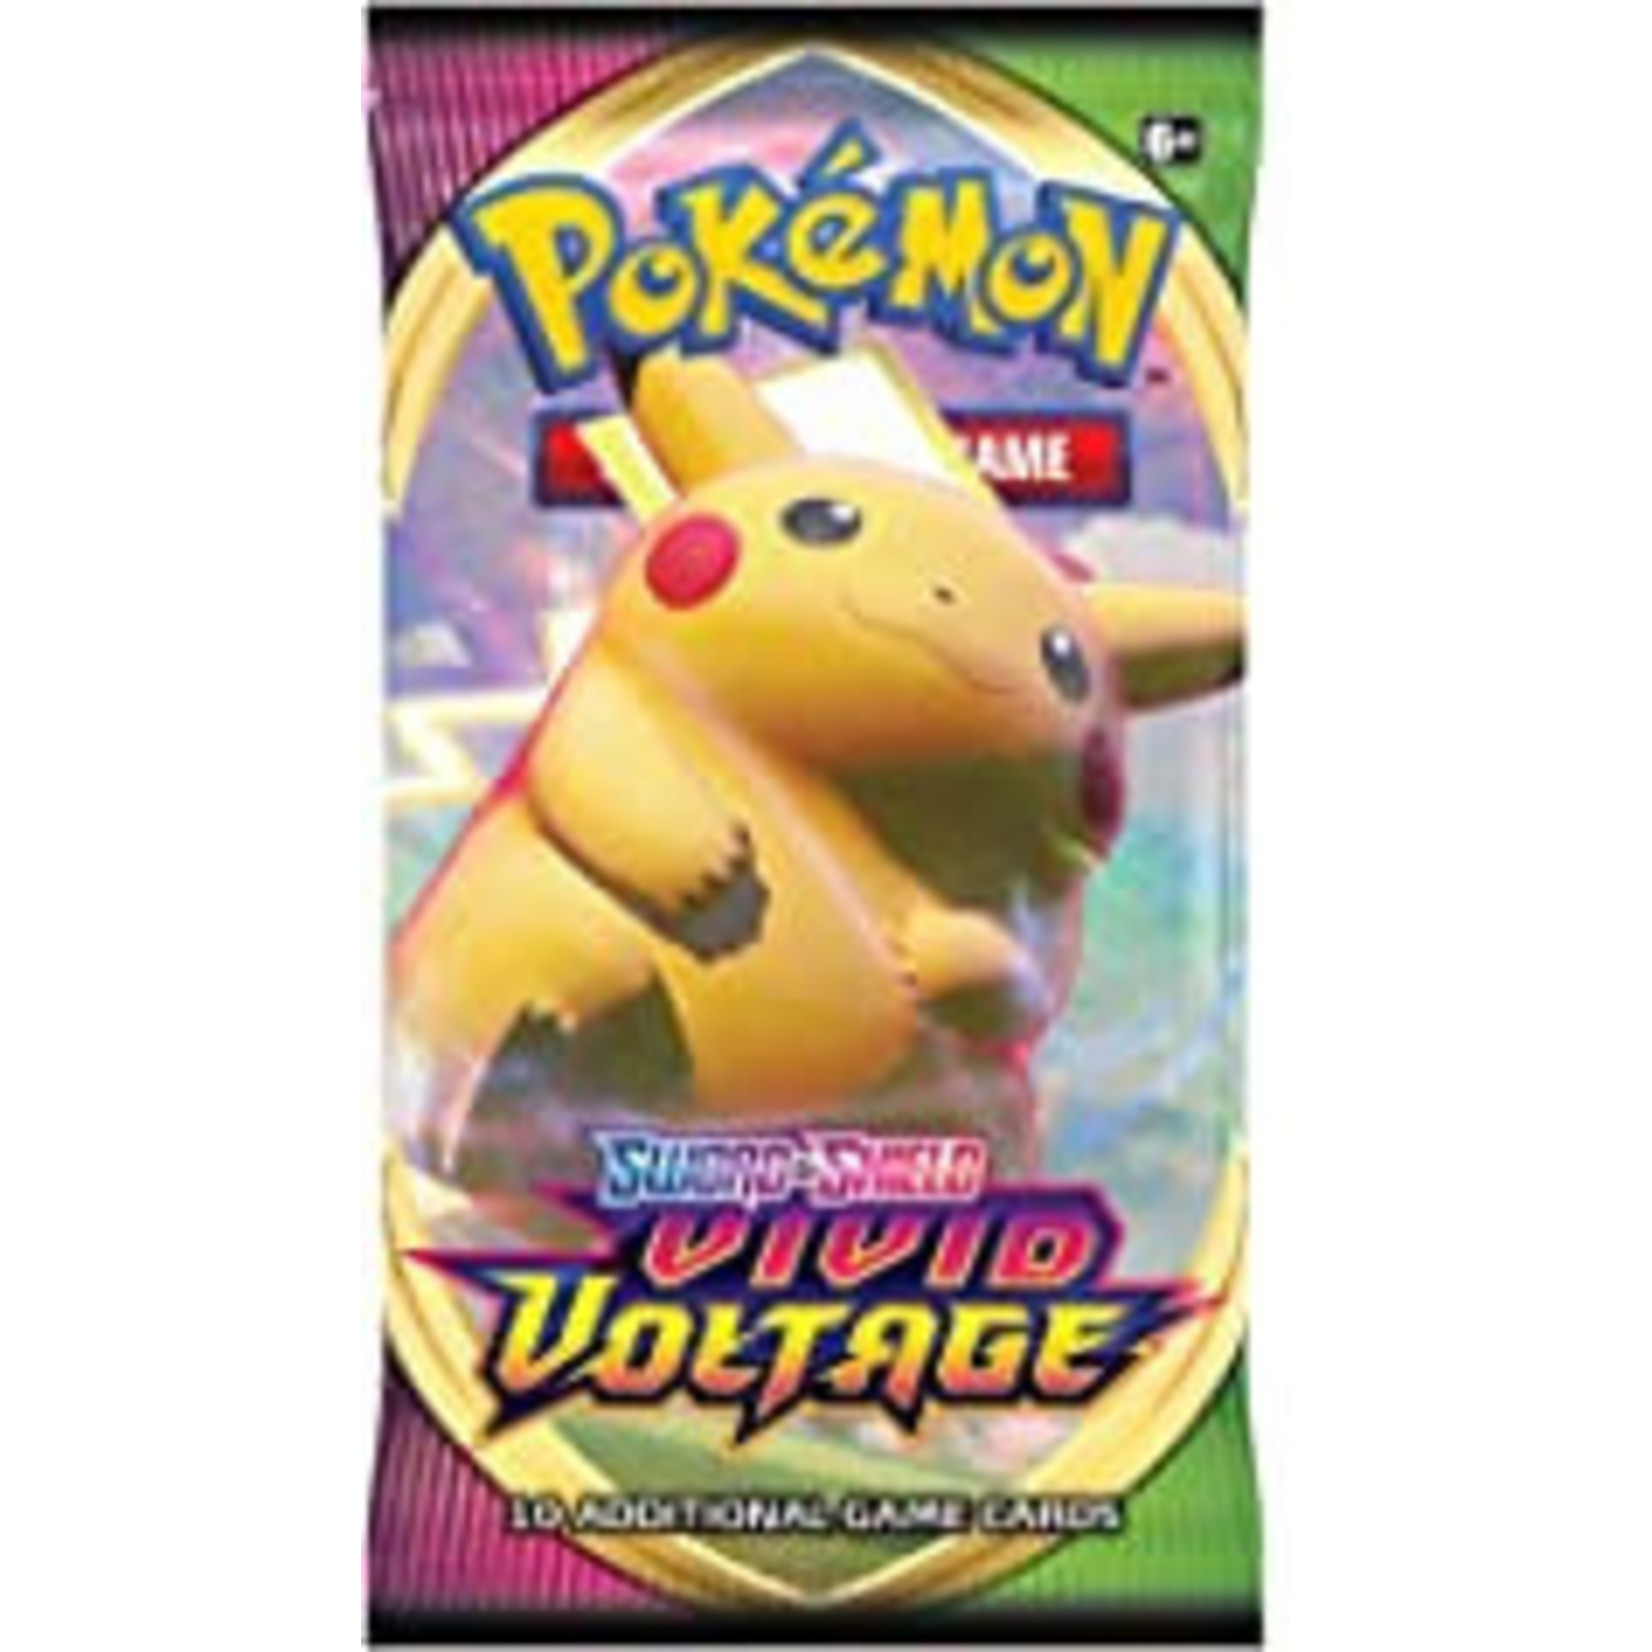 Pokemon International Pokemon Trading Card Game: Vivid Voltage Booster Pack